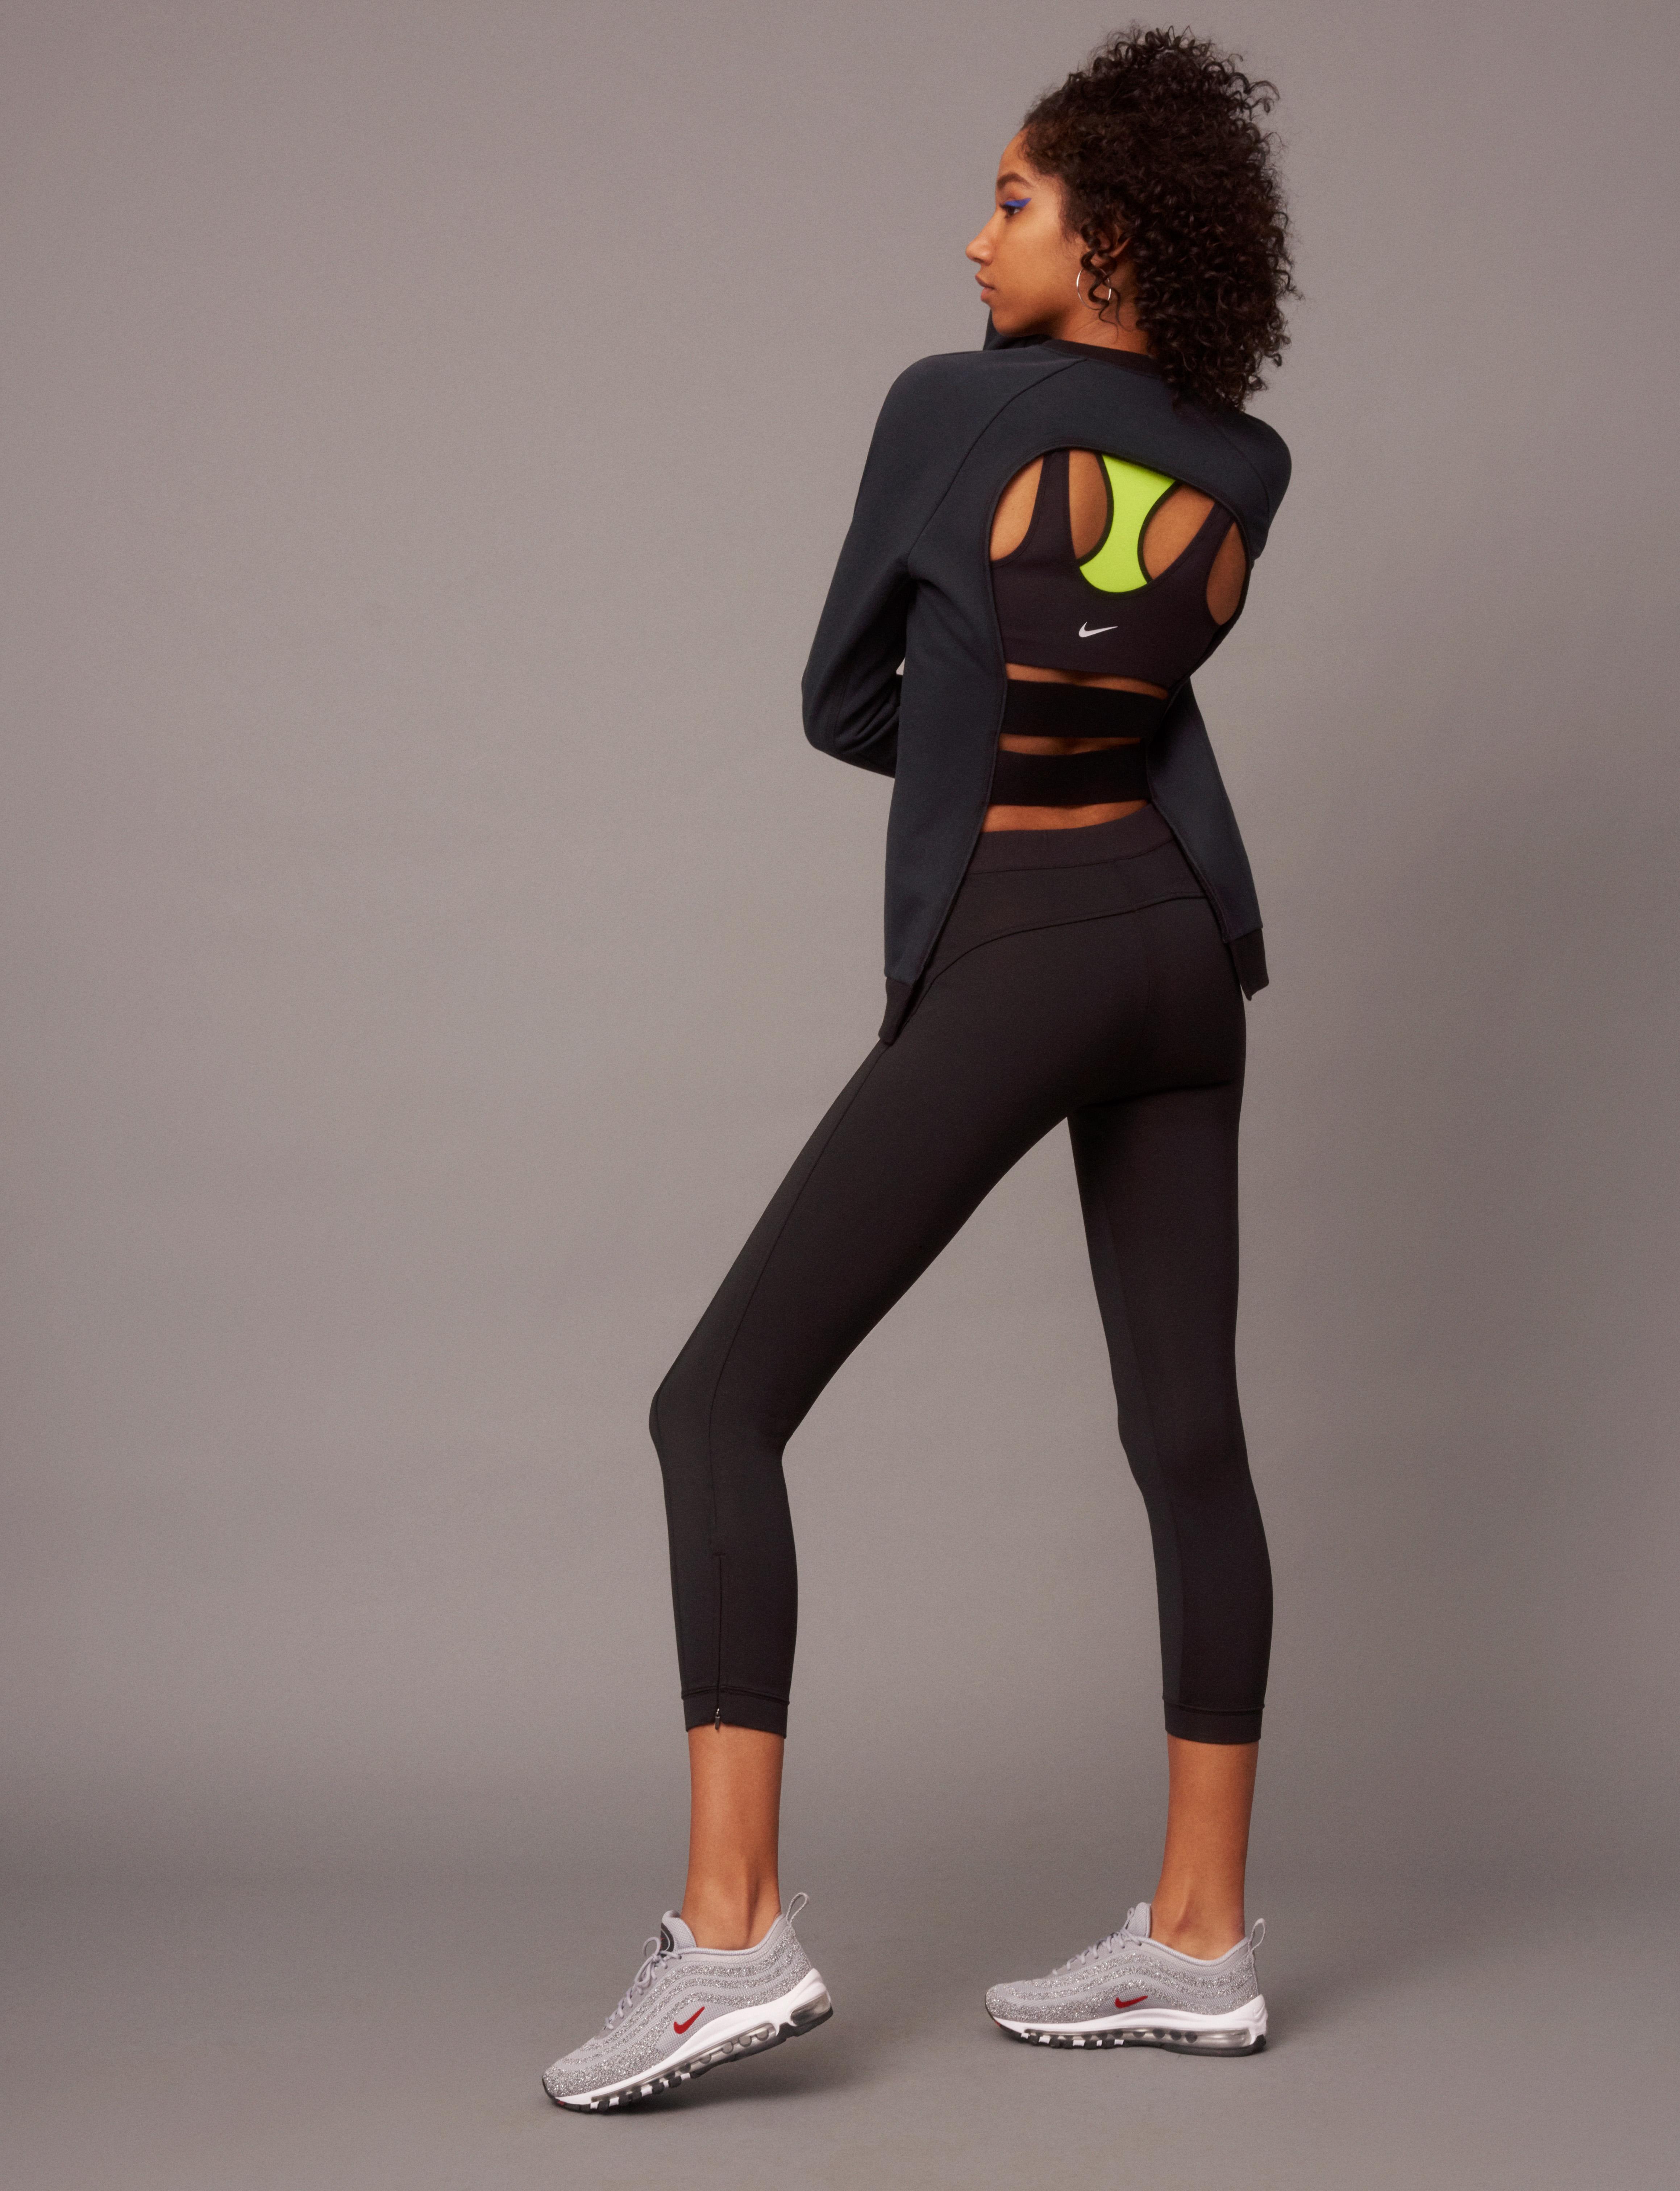 NikeWomen FA 17 Collection Look 16